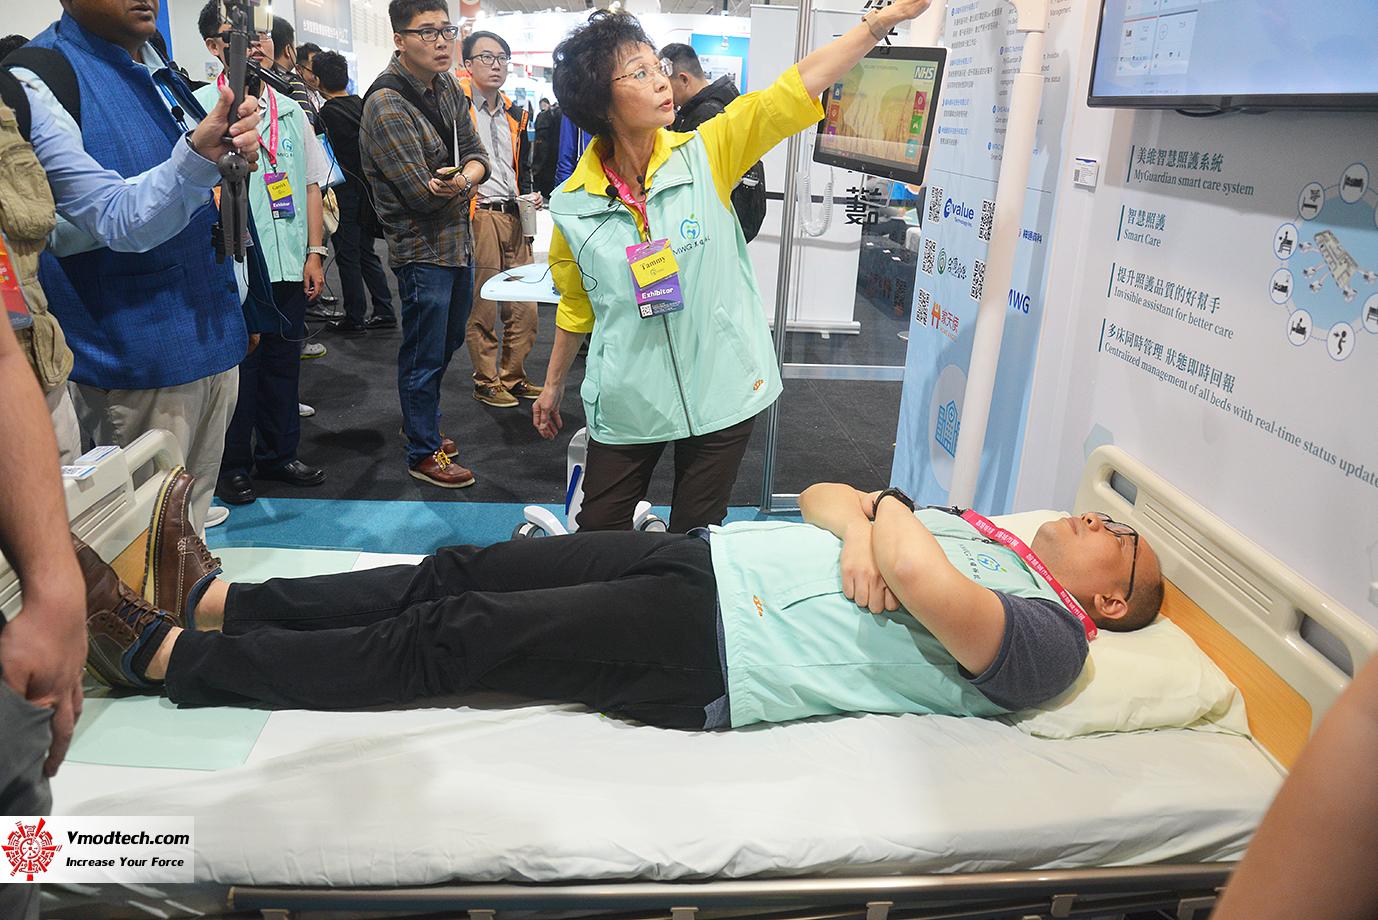 dsc 8823 เยี่ยมชมบูธ Smart Healthcare Expo กับเทคโนโลยีระบบการแพทย์และการดูแลสุขภาพอัจฉริยะในงาน 2019 SMART CITY SUMMIT & EXPO ณ กรุงไทเป ประเทศไต้หวัน